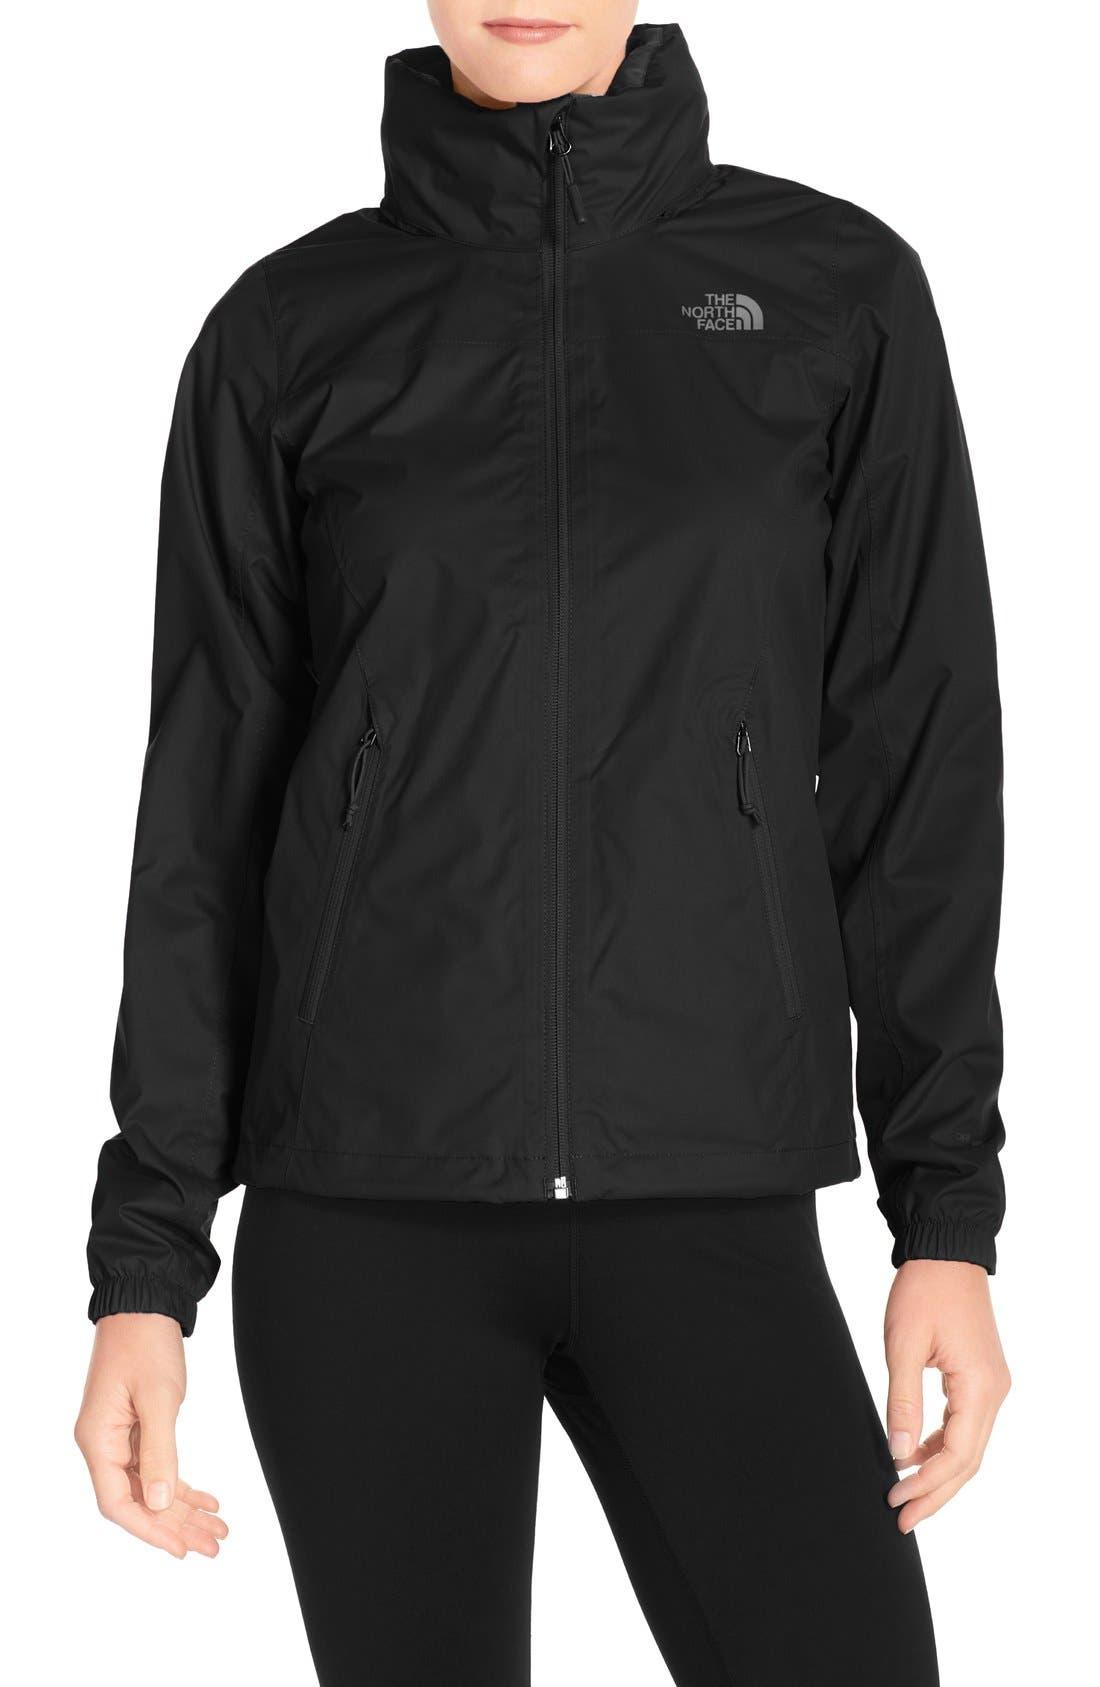 Alternate Image 1 Selected - The North Face 'Resolve Plus' Waterproof Jacket